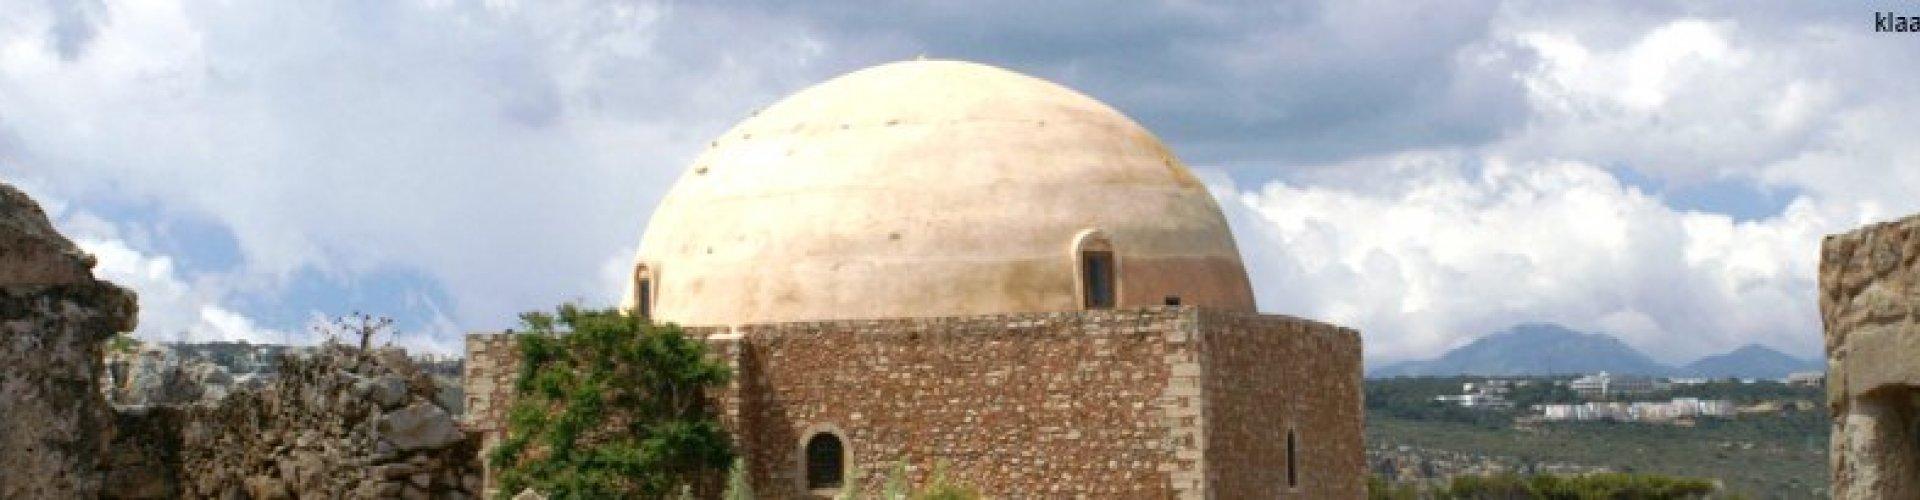 Fortezza Rethymnon